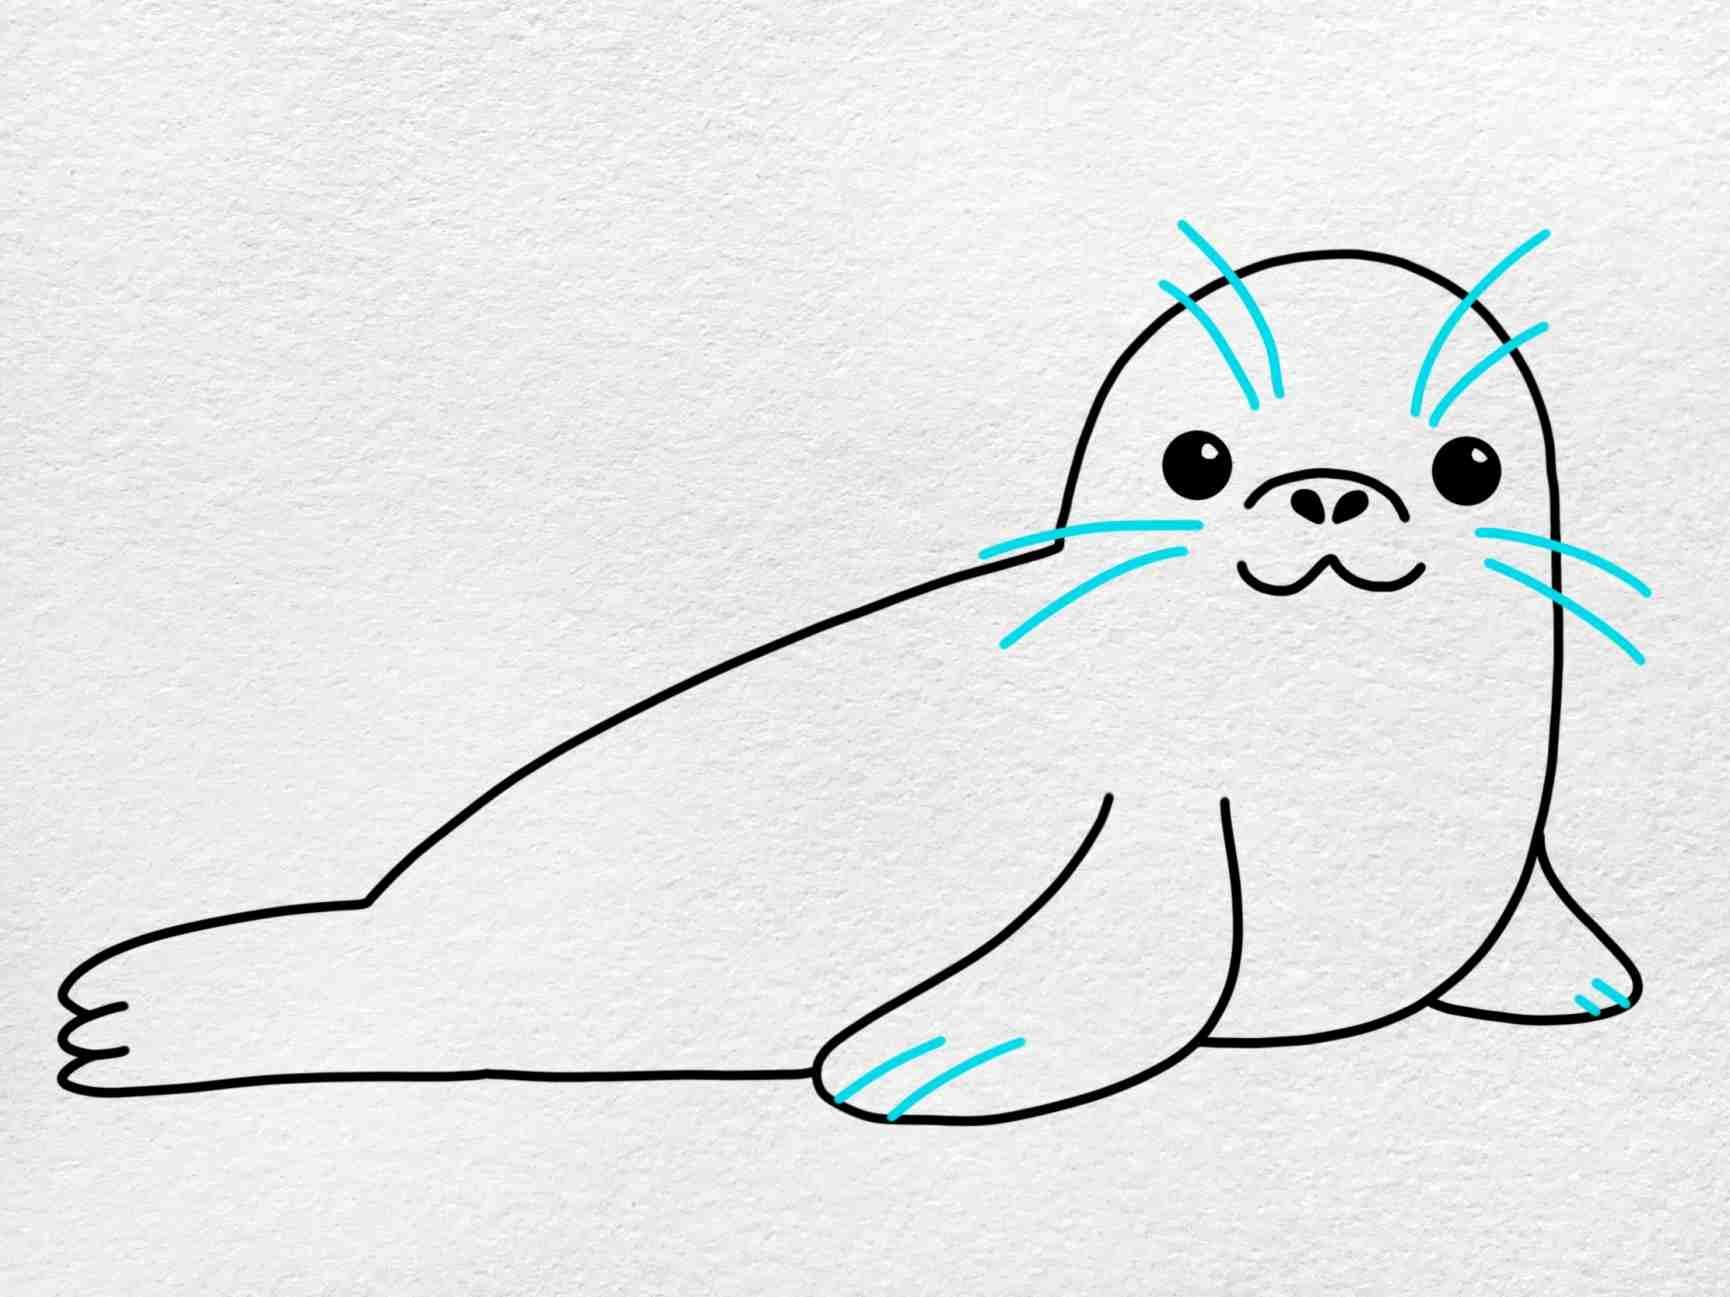 Seal Drawing: Step 5